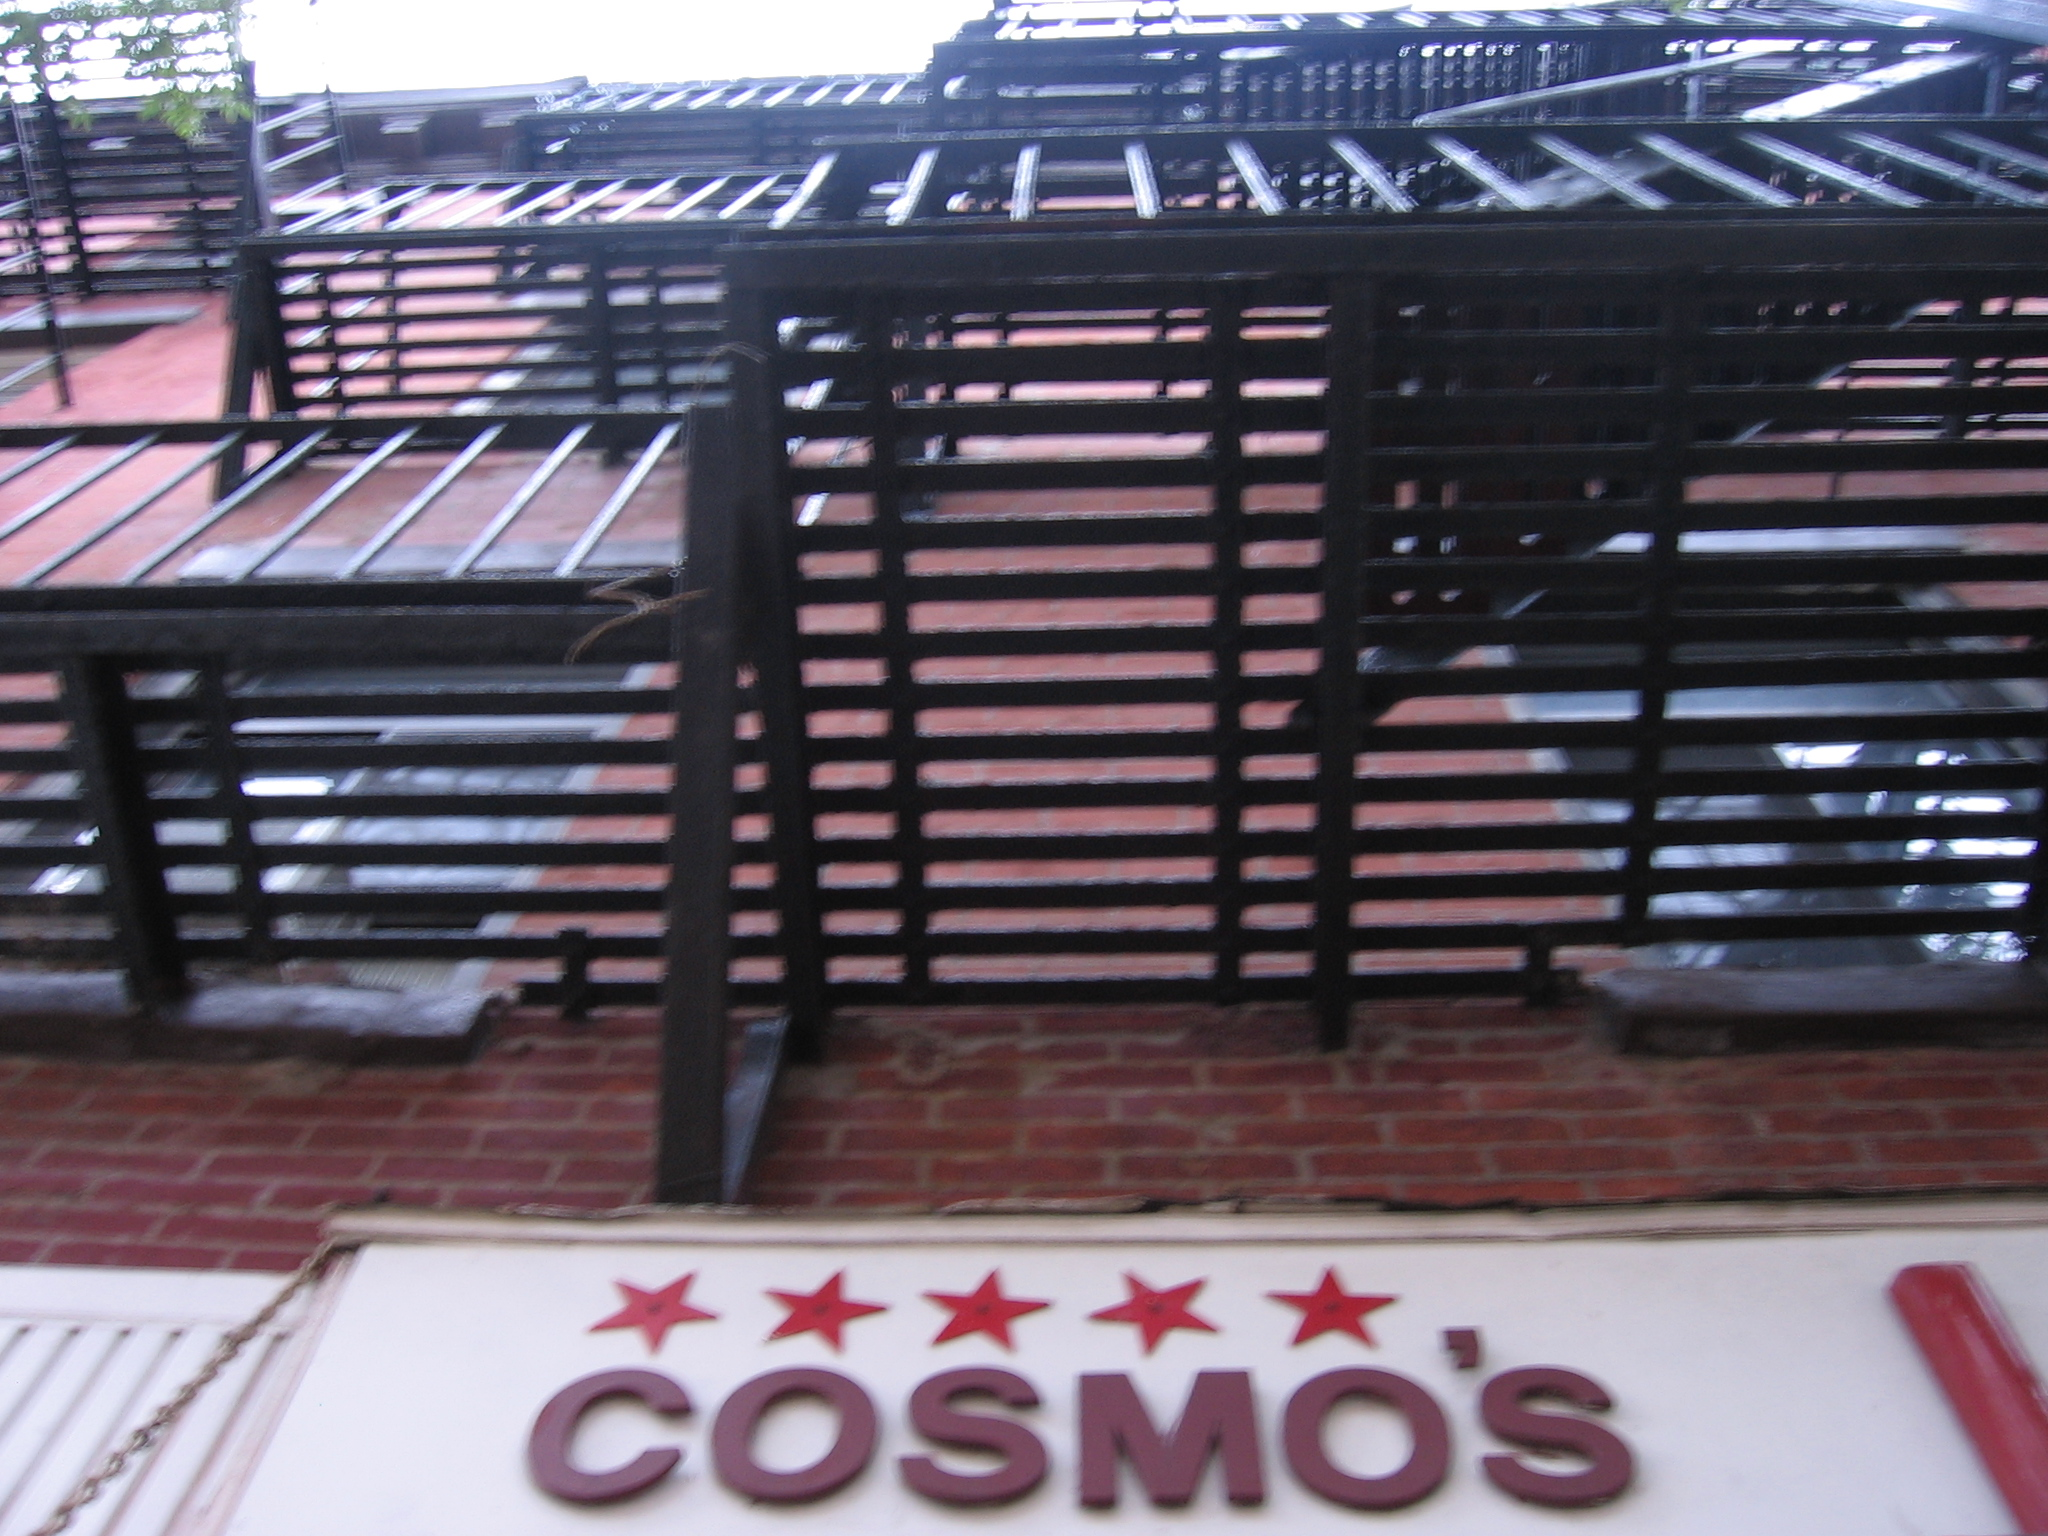 stars-cosmos sign.JPG